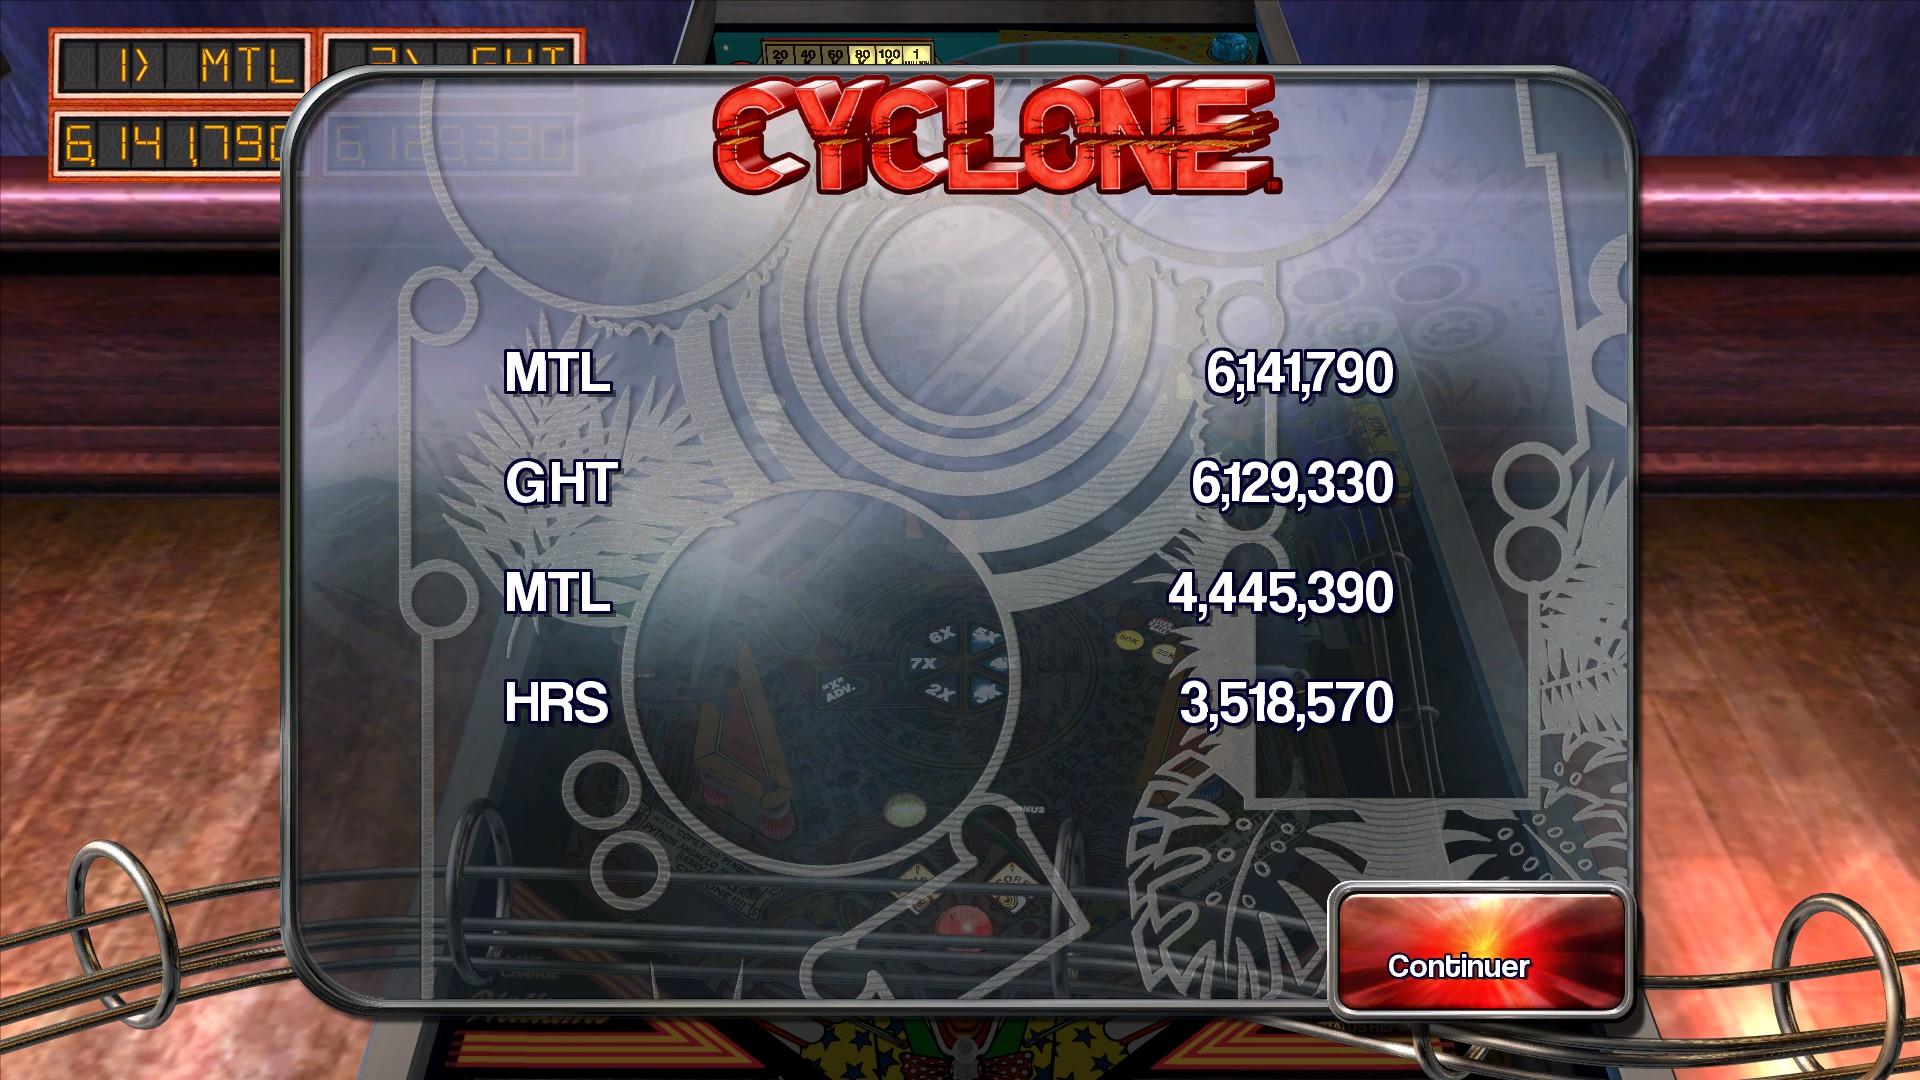 Mantalow: Pinball Arcade: Cyclone (PC) 6,141,790 points on 2015-03-29 04:22:05